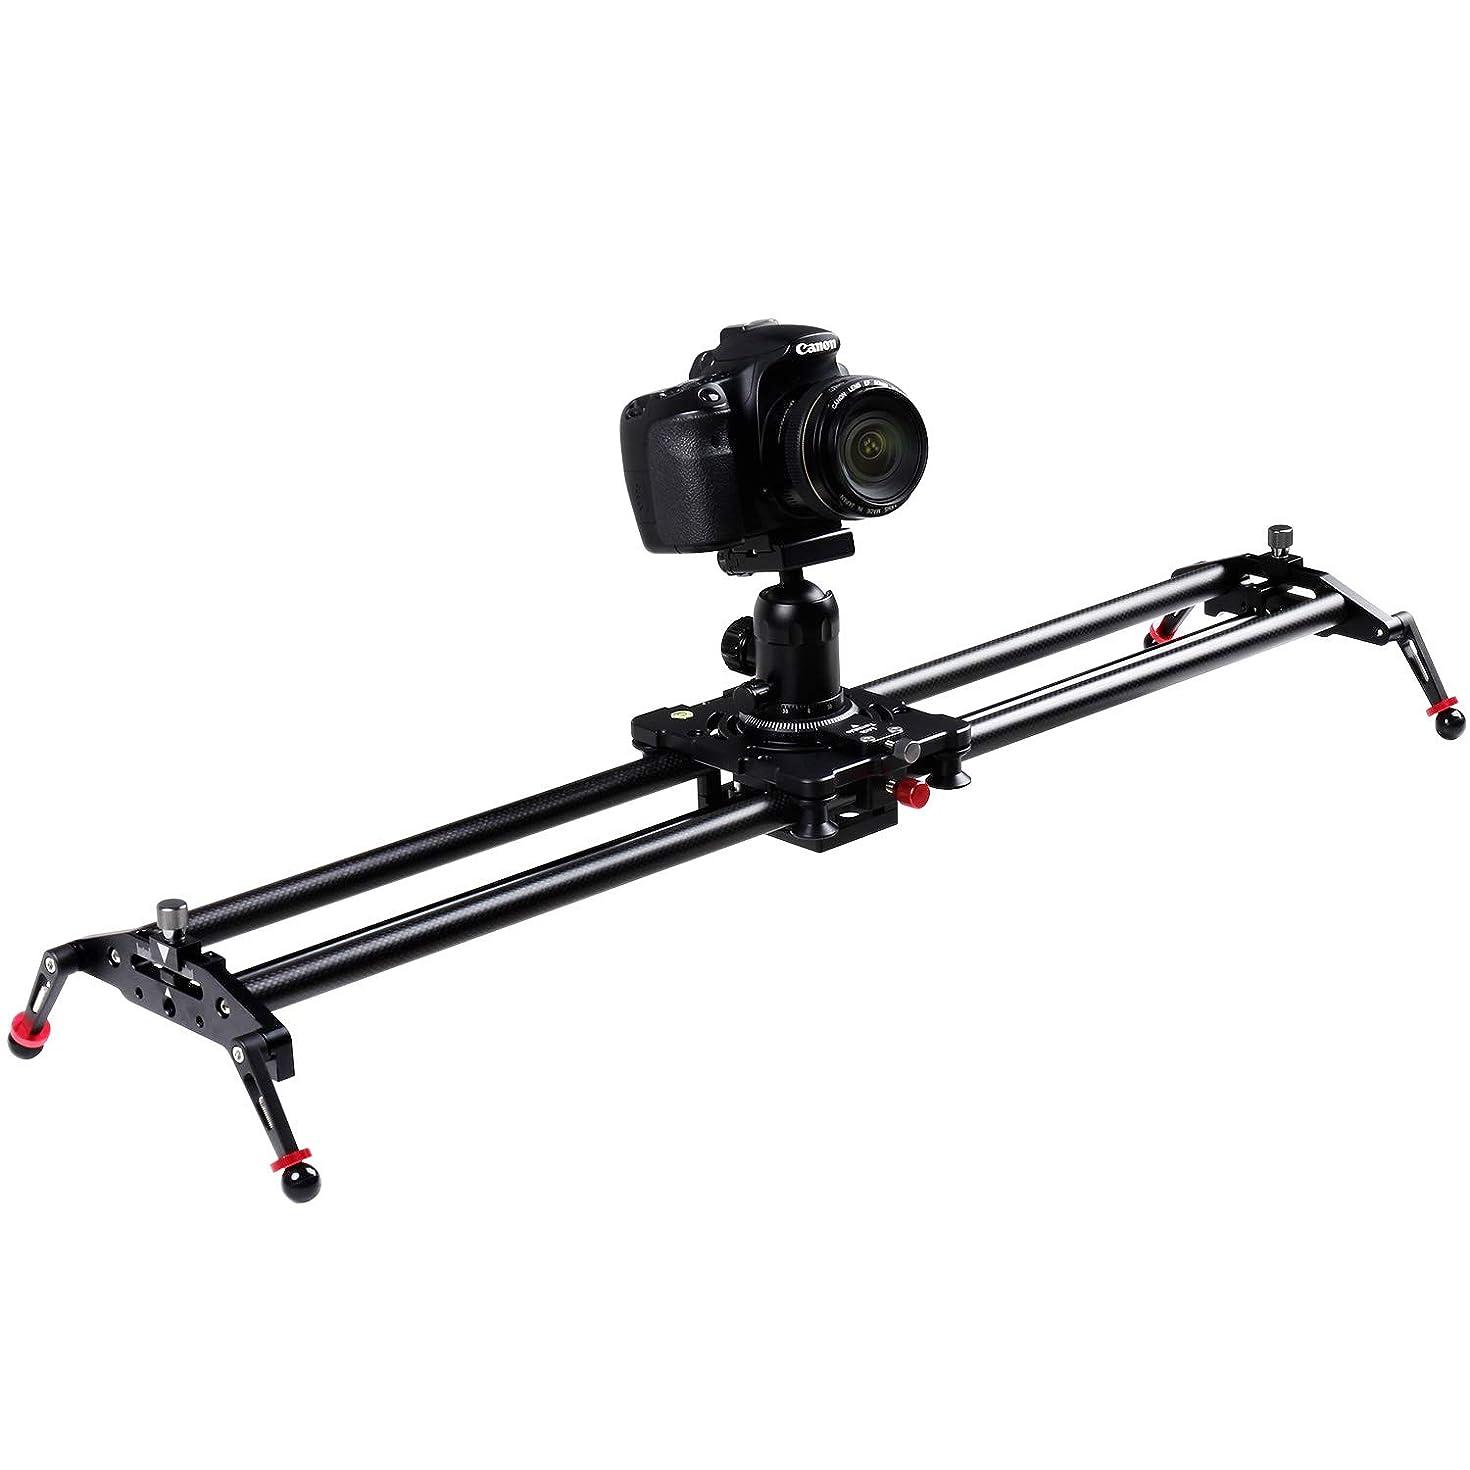 ASHANKS S2 0.8m/2.6ft Track Camera Slider Carbon Fiber Adjustable Angle Tube Follow Focus Pan for Stabilizer DV DSLR Camera YouTube Video Shooting